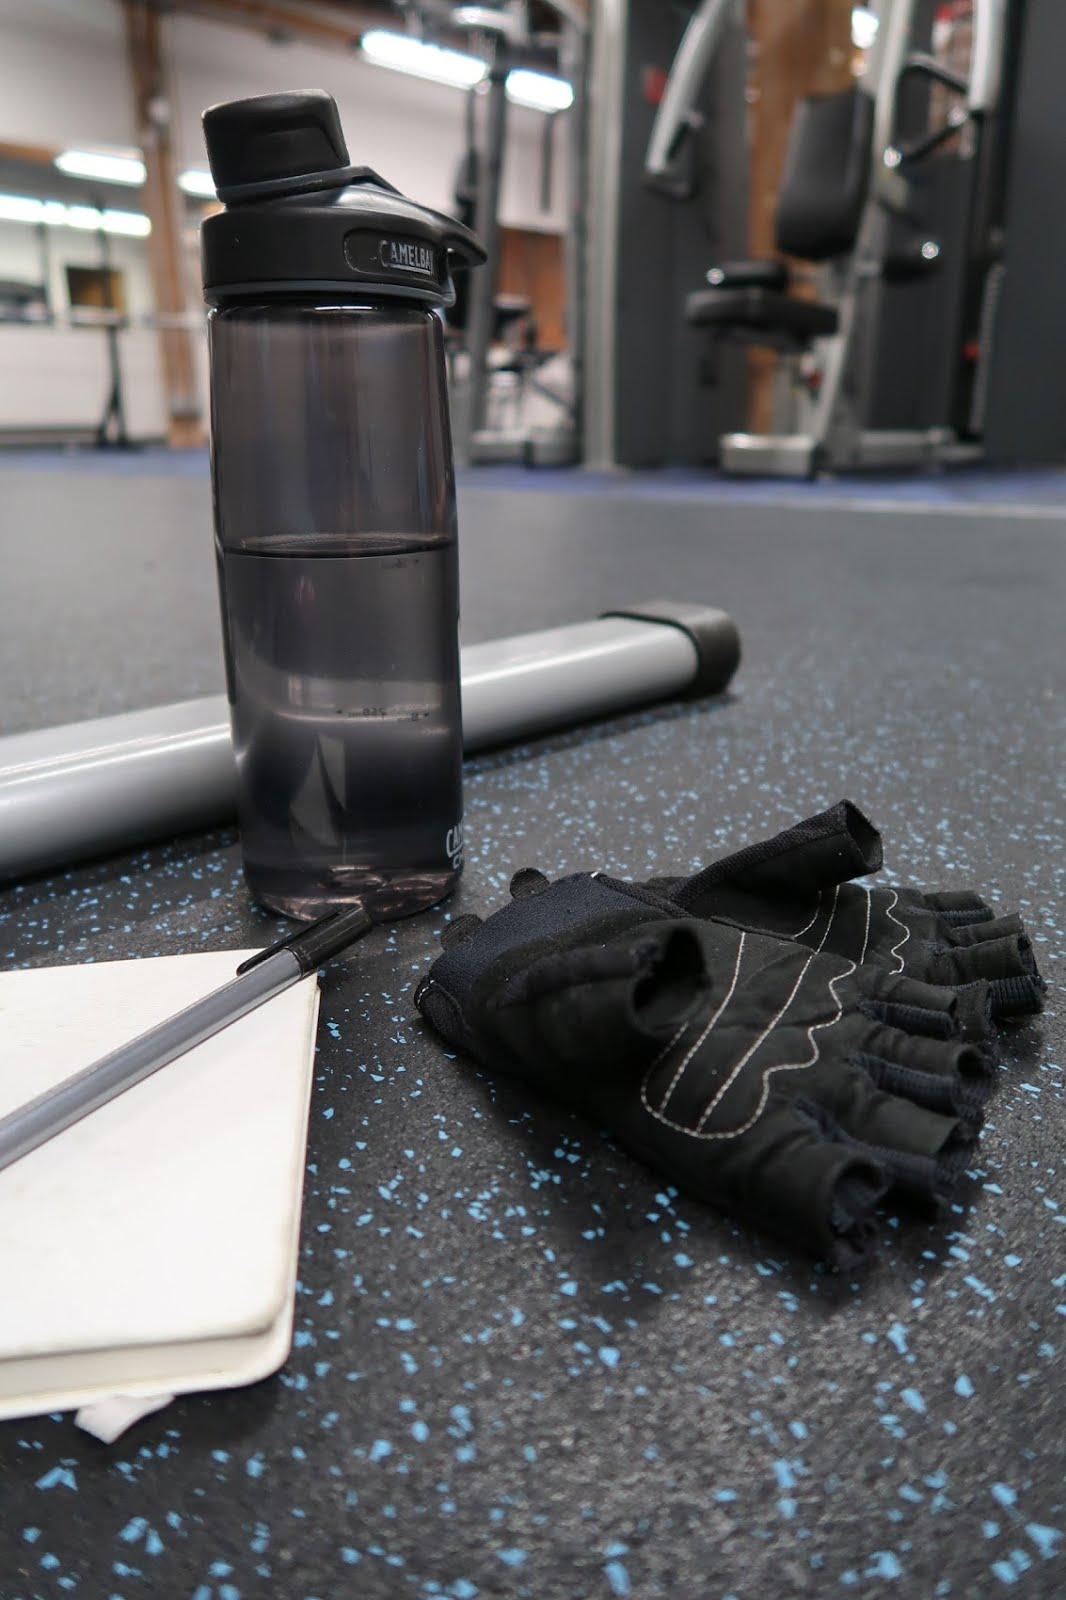 gym fitness workout routine plan schedule weight cardio water bottle moleskin notebook staedler triplus fineliner camelback weight gloves nike